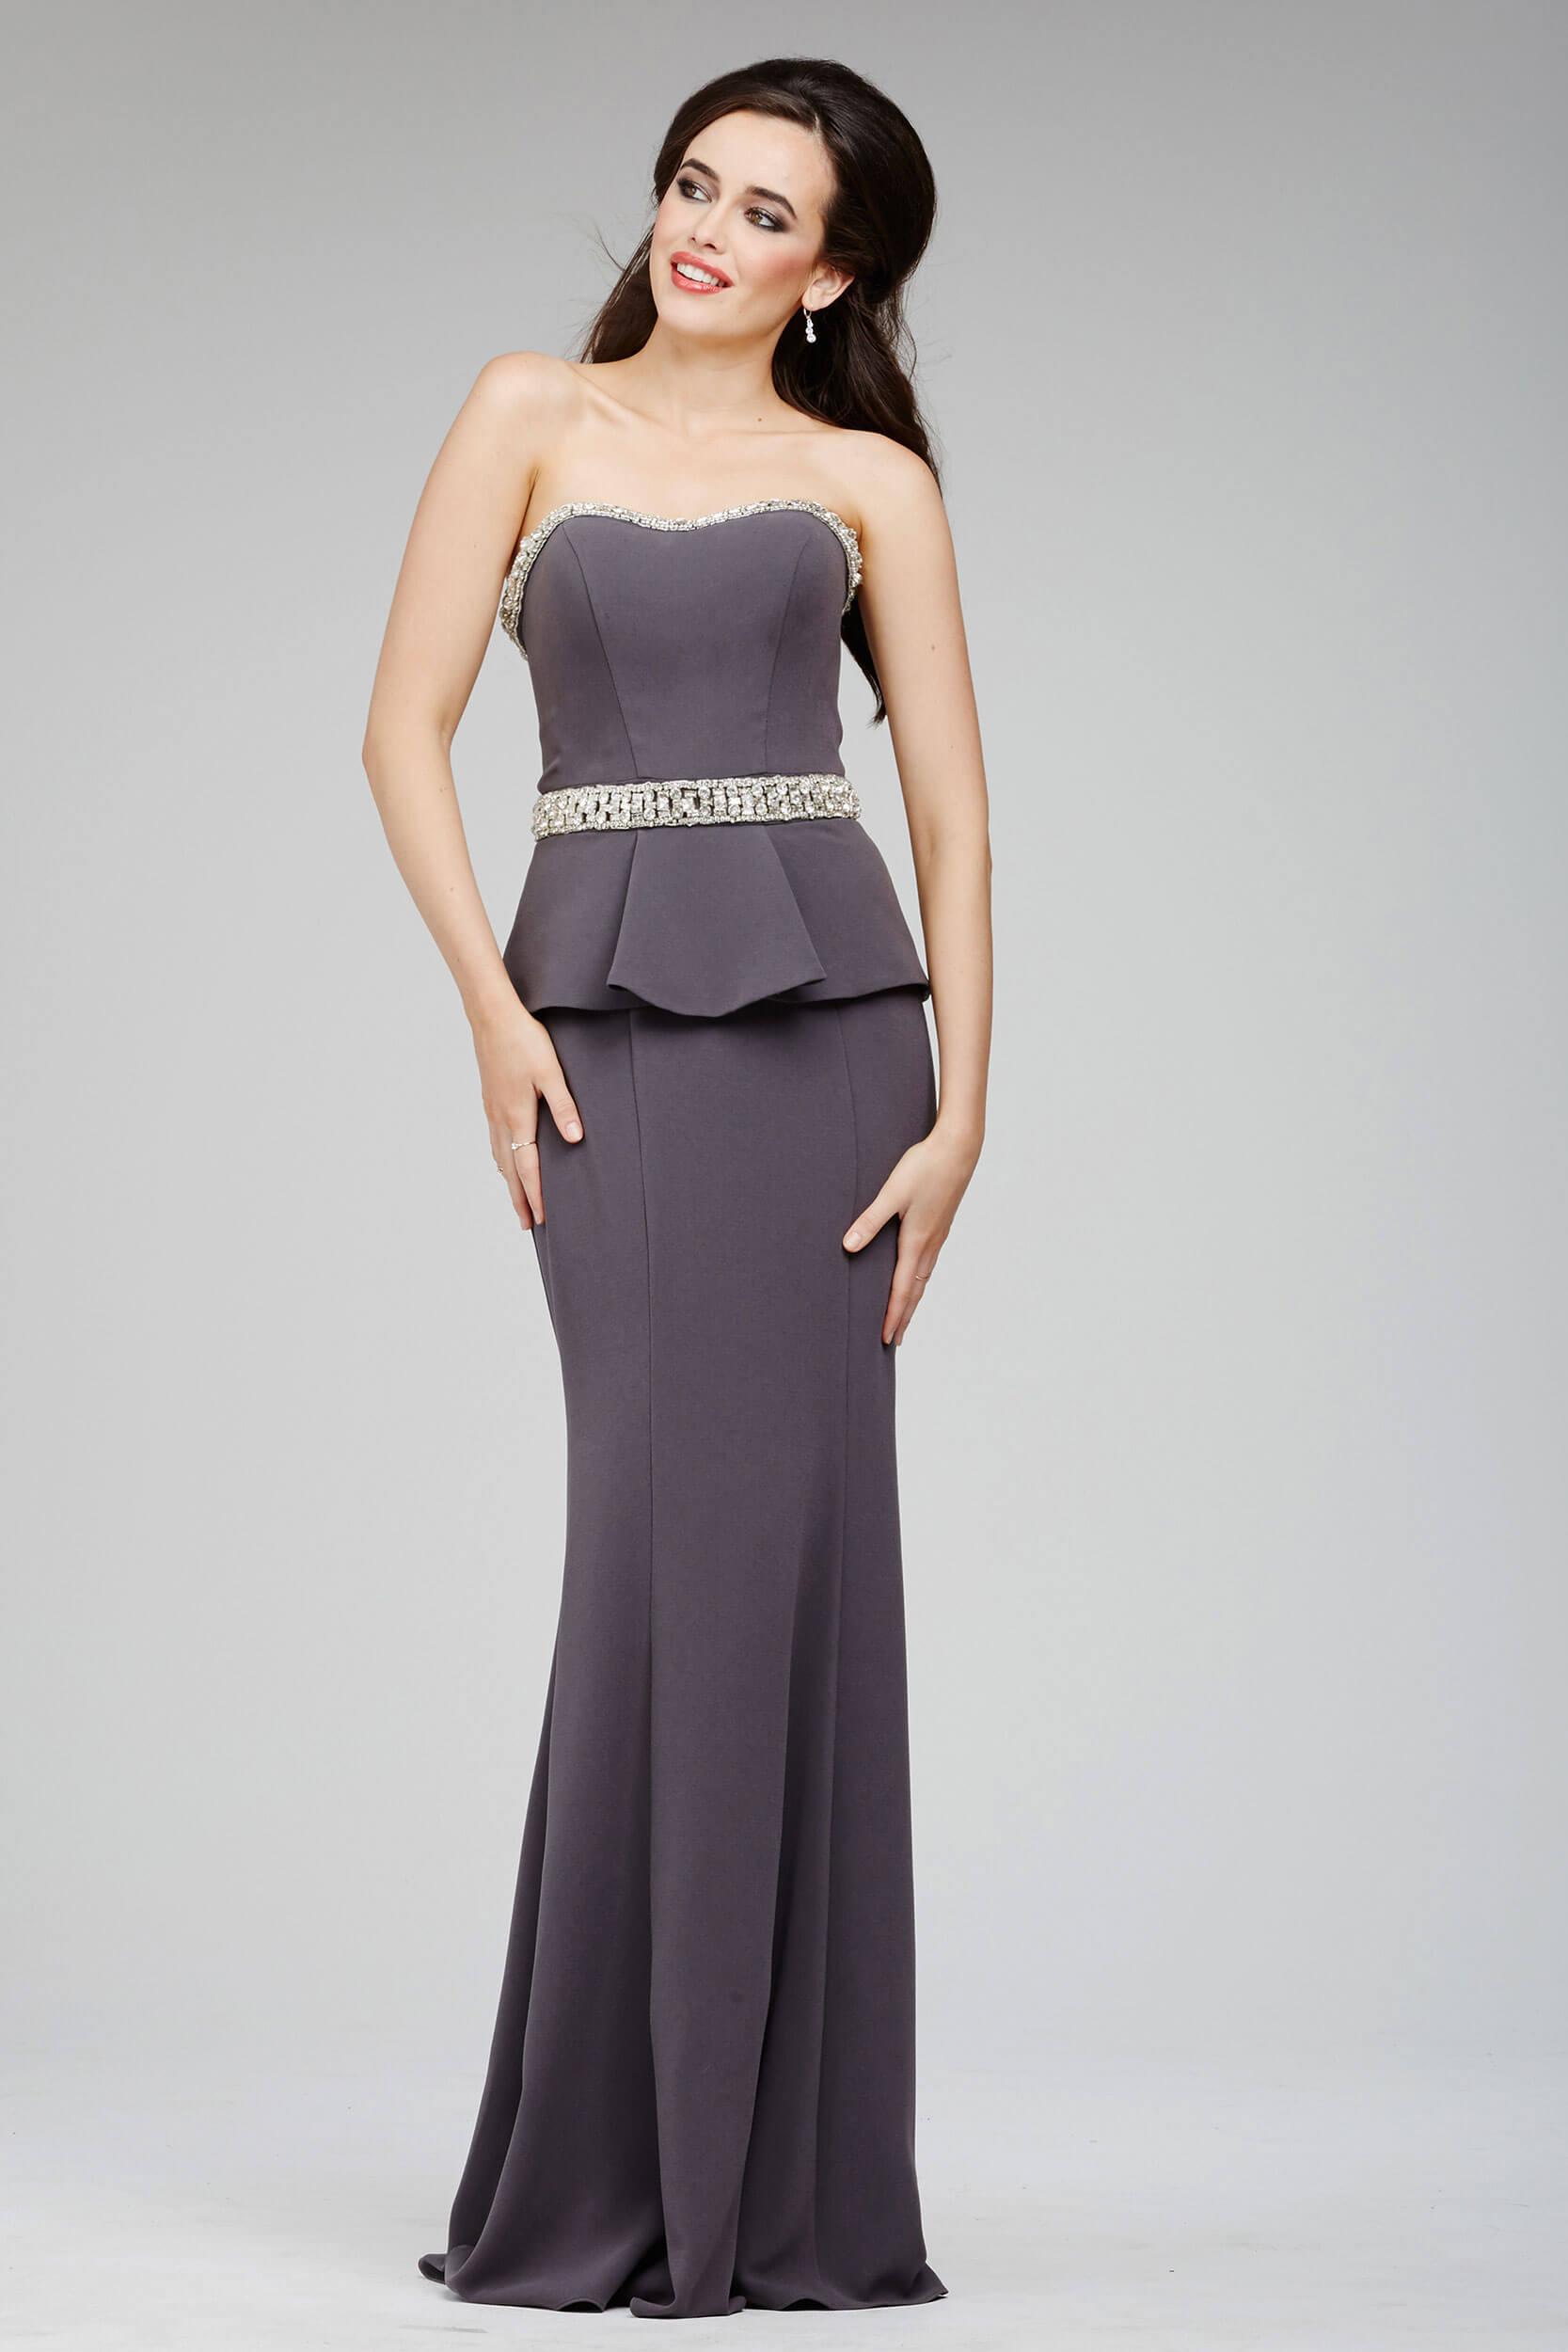 8dc5308d49d9 Dark Grey Semi Formal Dresses - raveitsafe